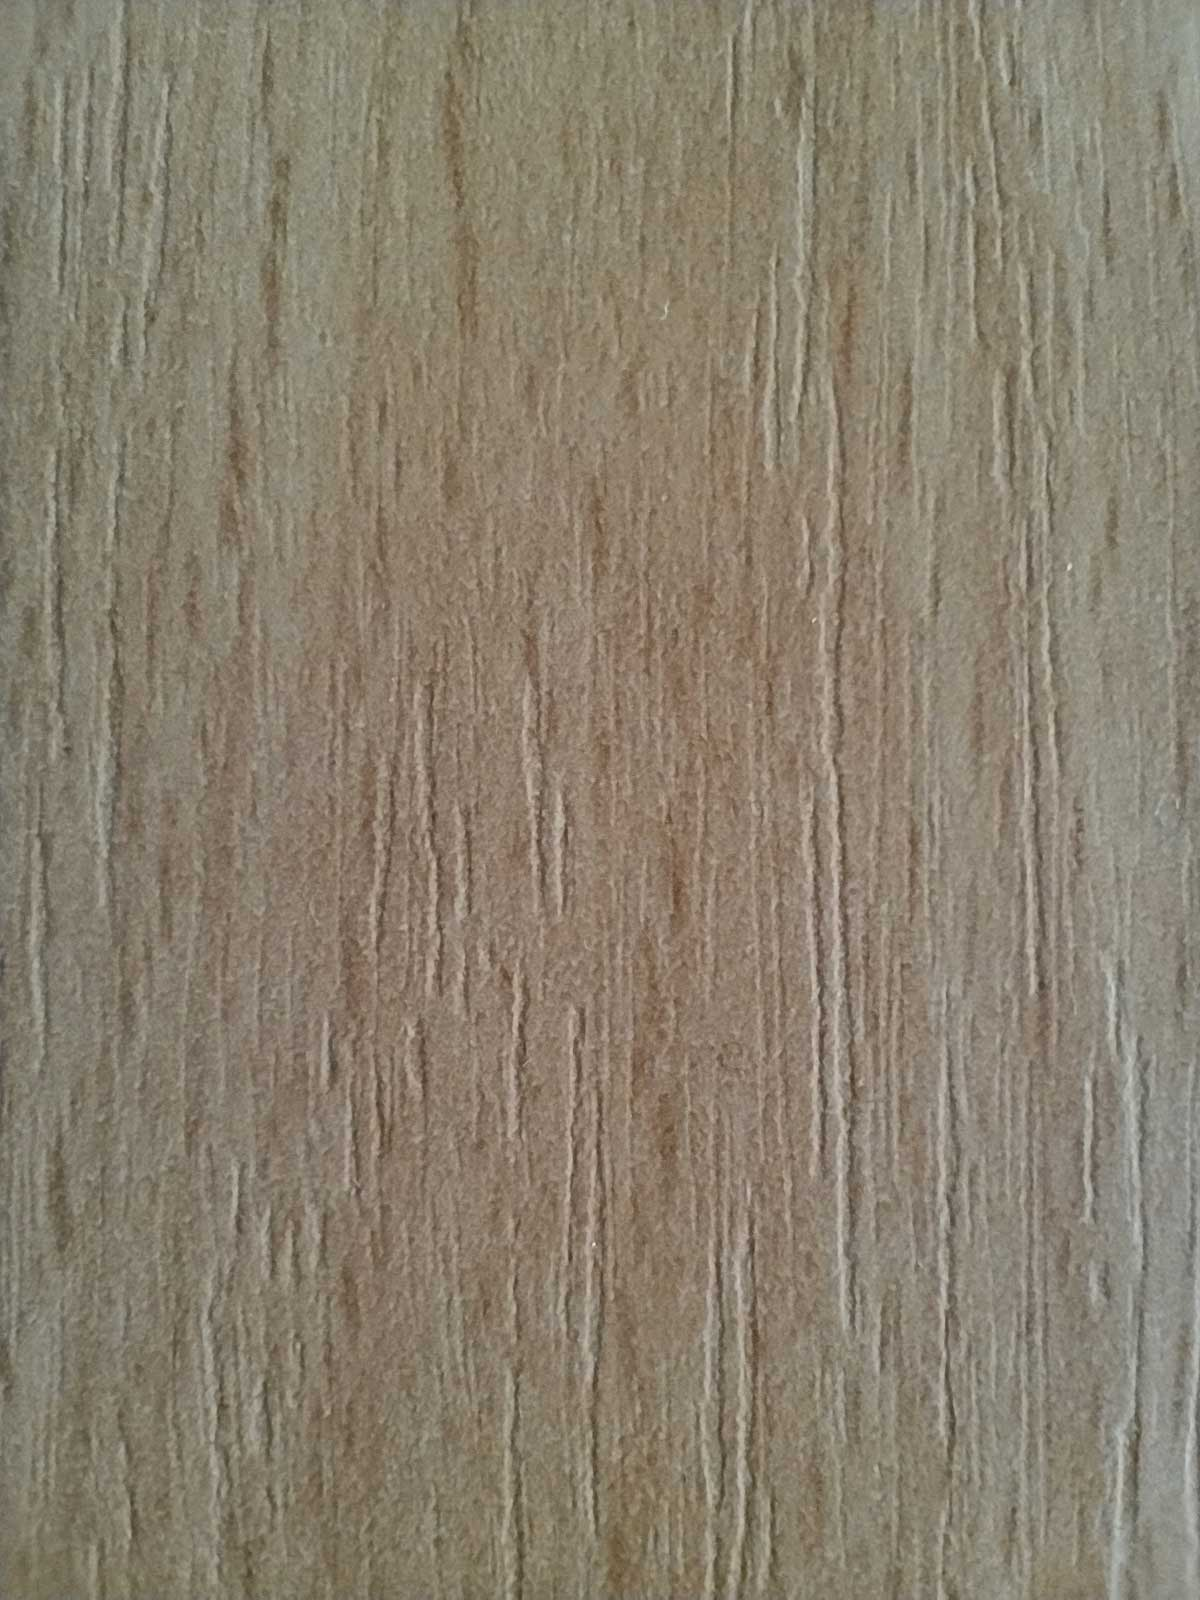 Makro fotografia dreva - moto g30